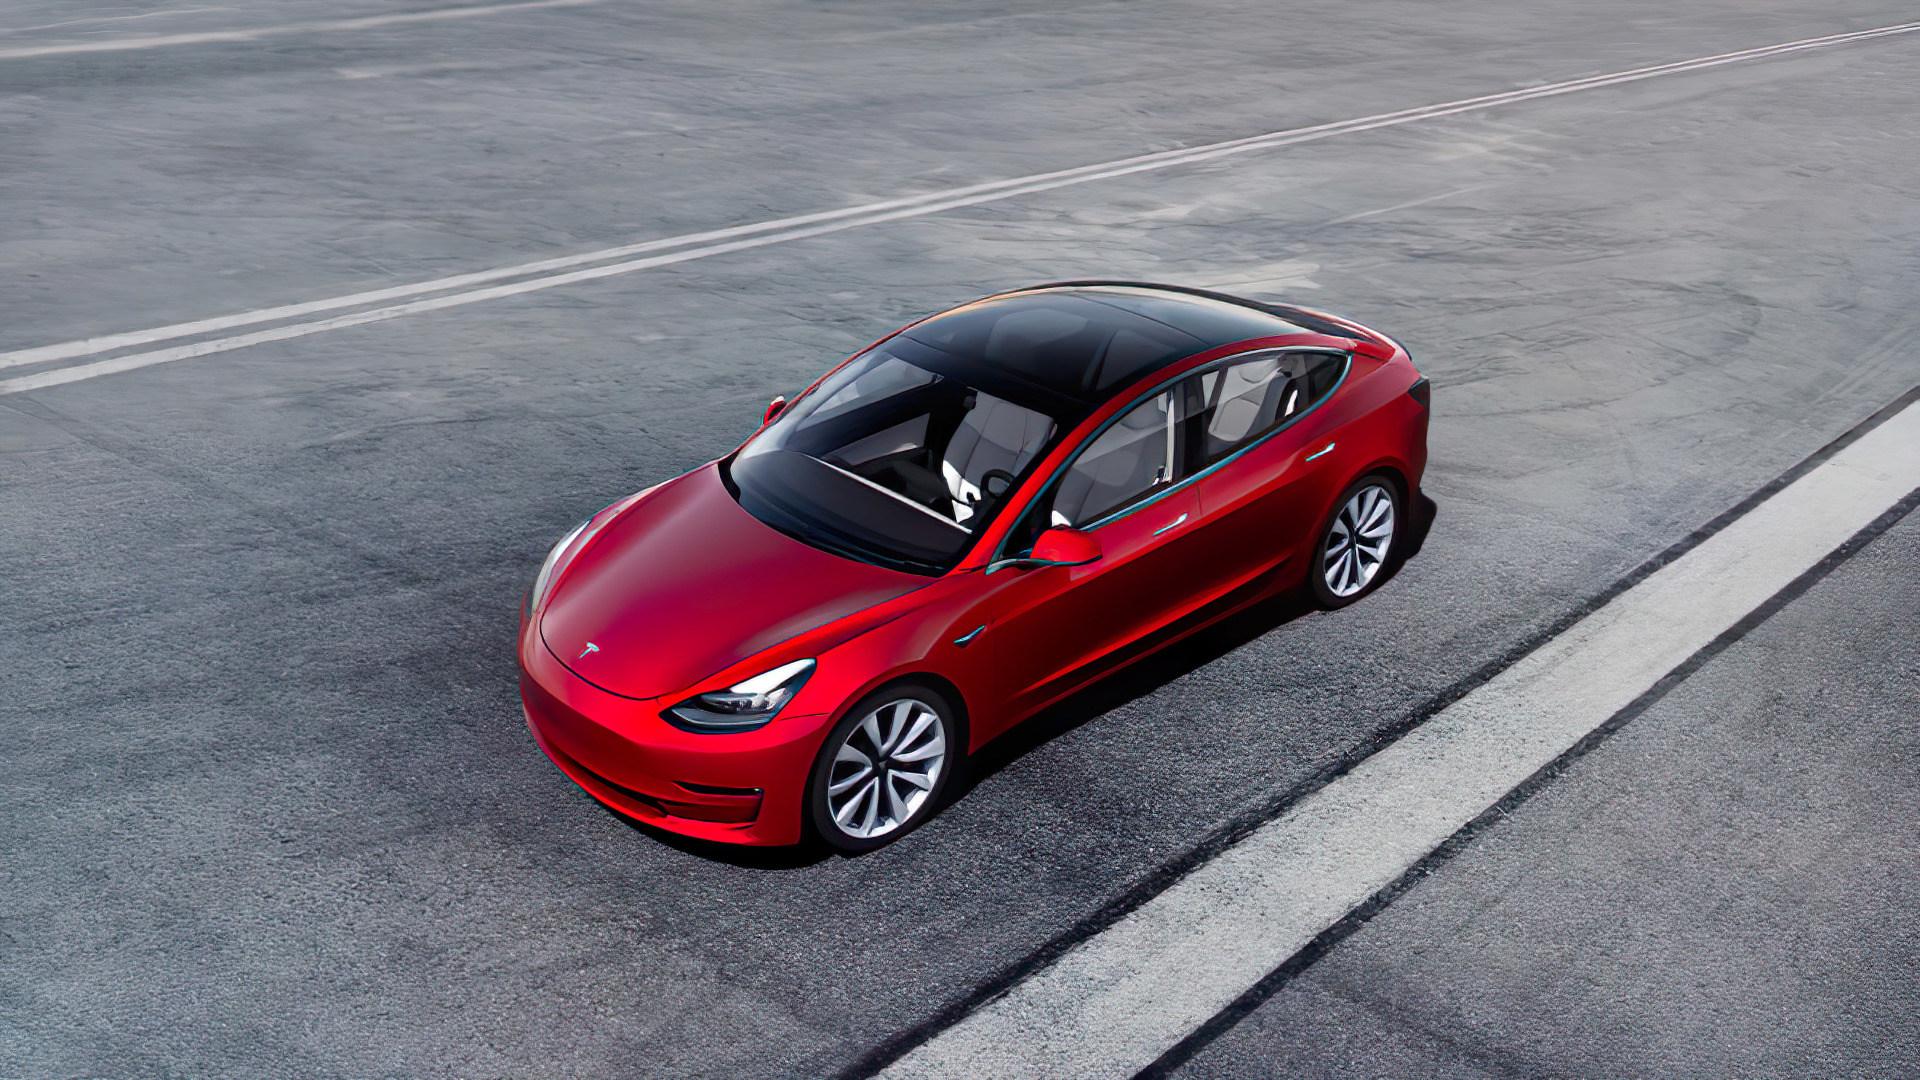 tesla, Elon Musk, Tesla Motors, Elektroauto, Model 3, Tesla Model 3